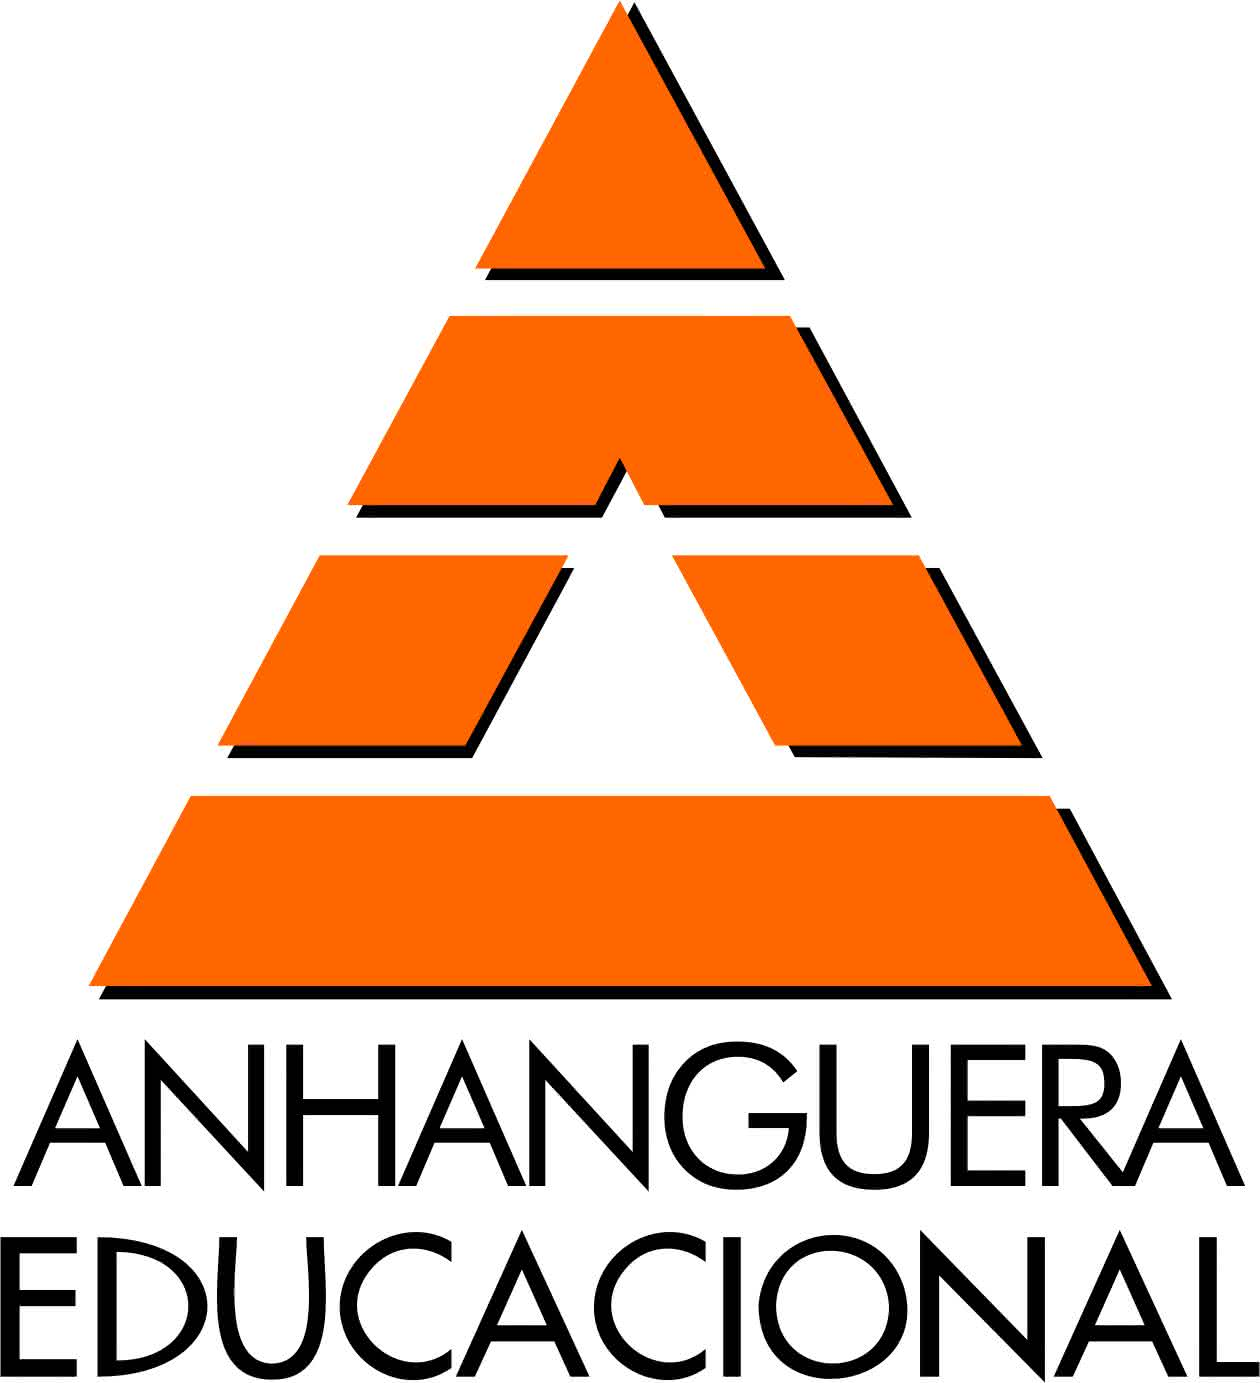 Anhanguera  Pra Uniban Por R  510 Milh  Es